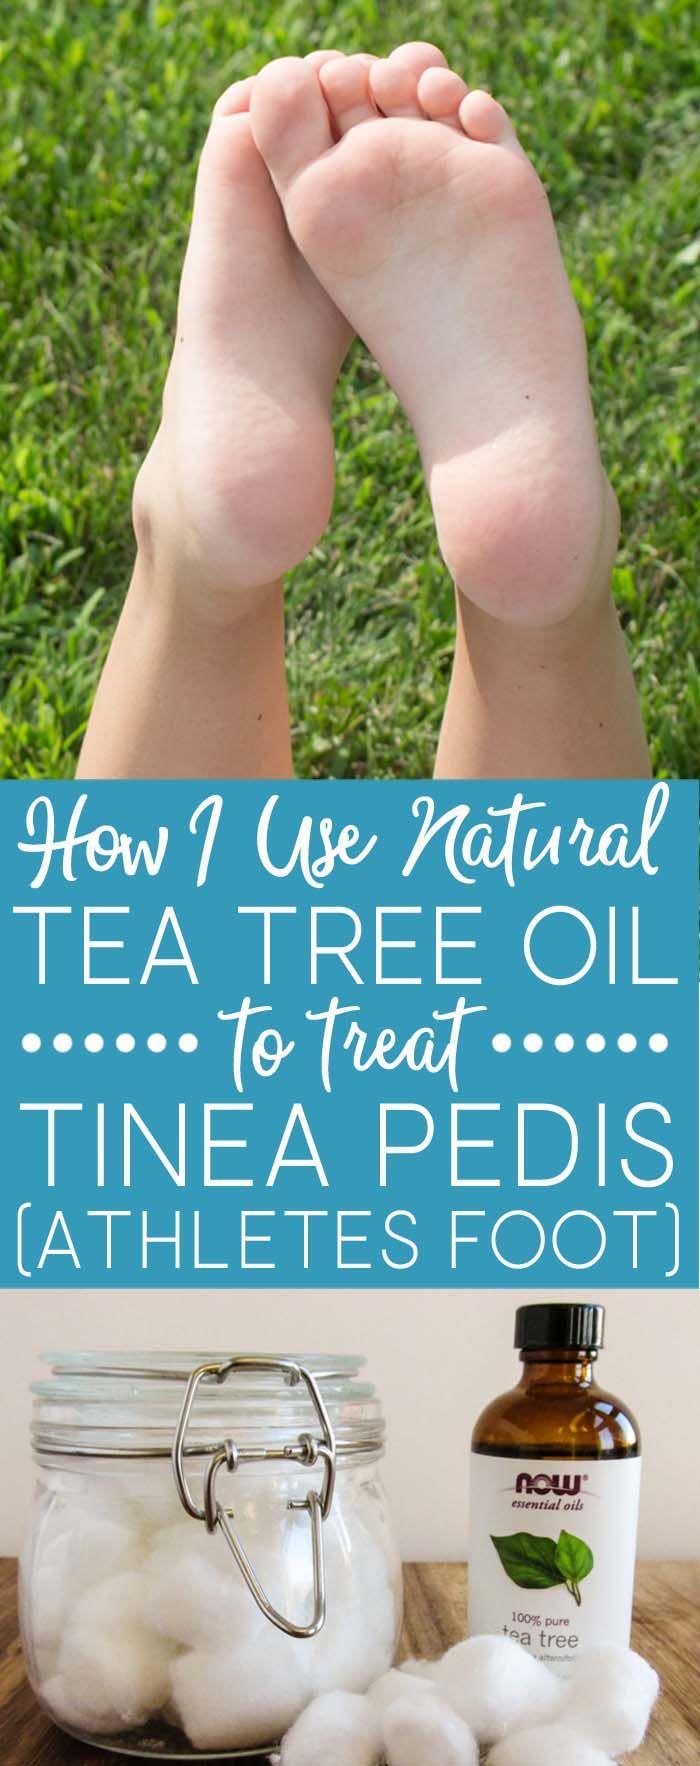 How I Use Tea Tree Oil to Treat Tinea Pedis Athletes Foot